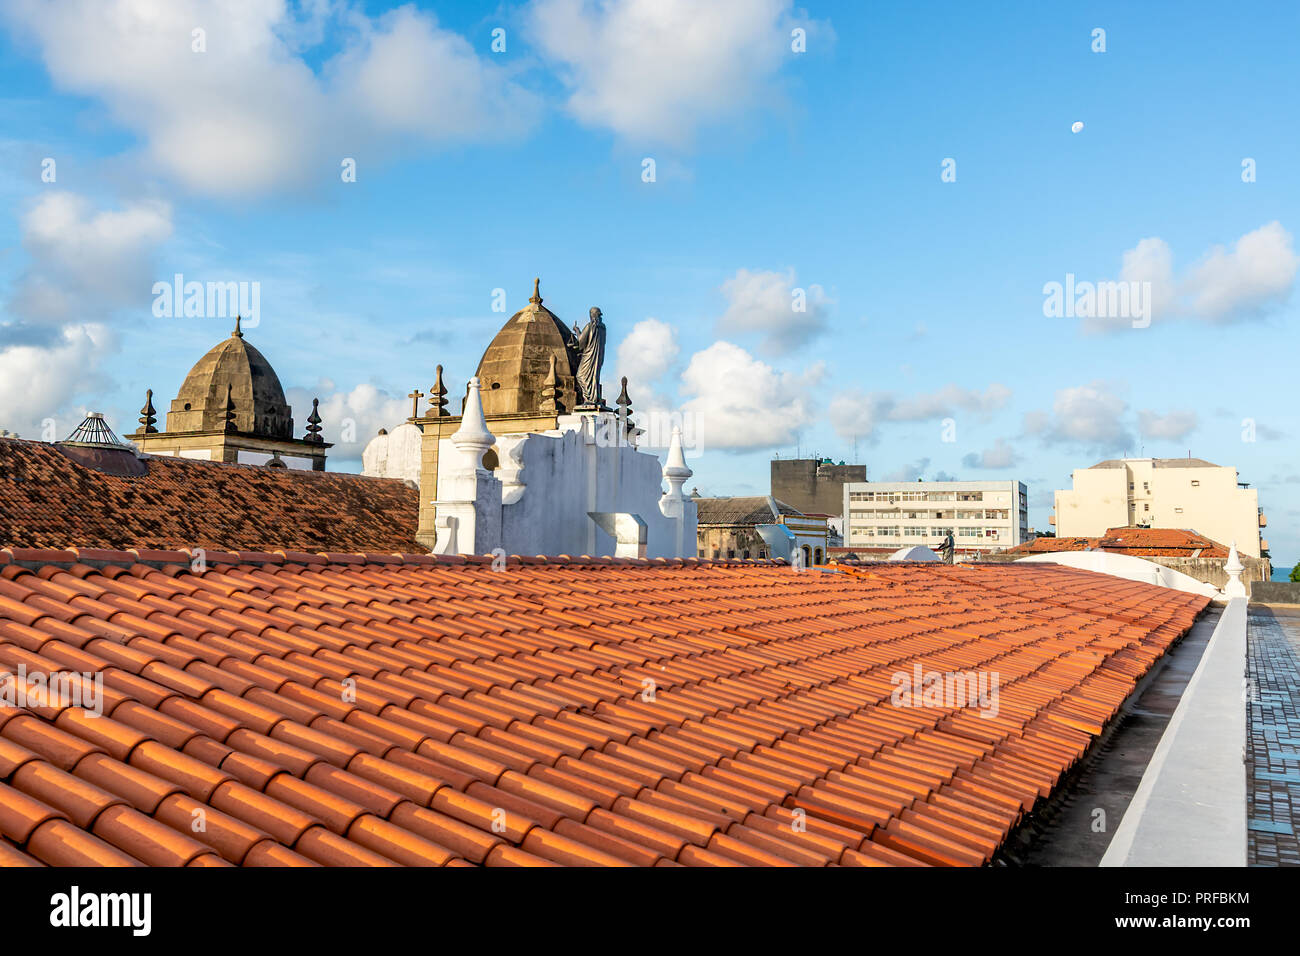 Rooftop view at Alfandega Bund (Cais da Alfândega), Recife, Pernambuco, Brazil - Stock Image